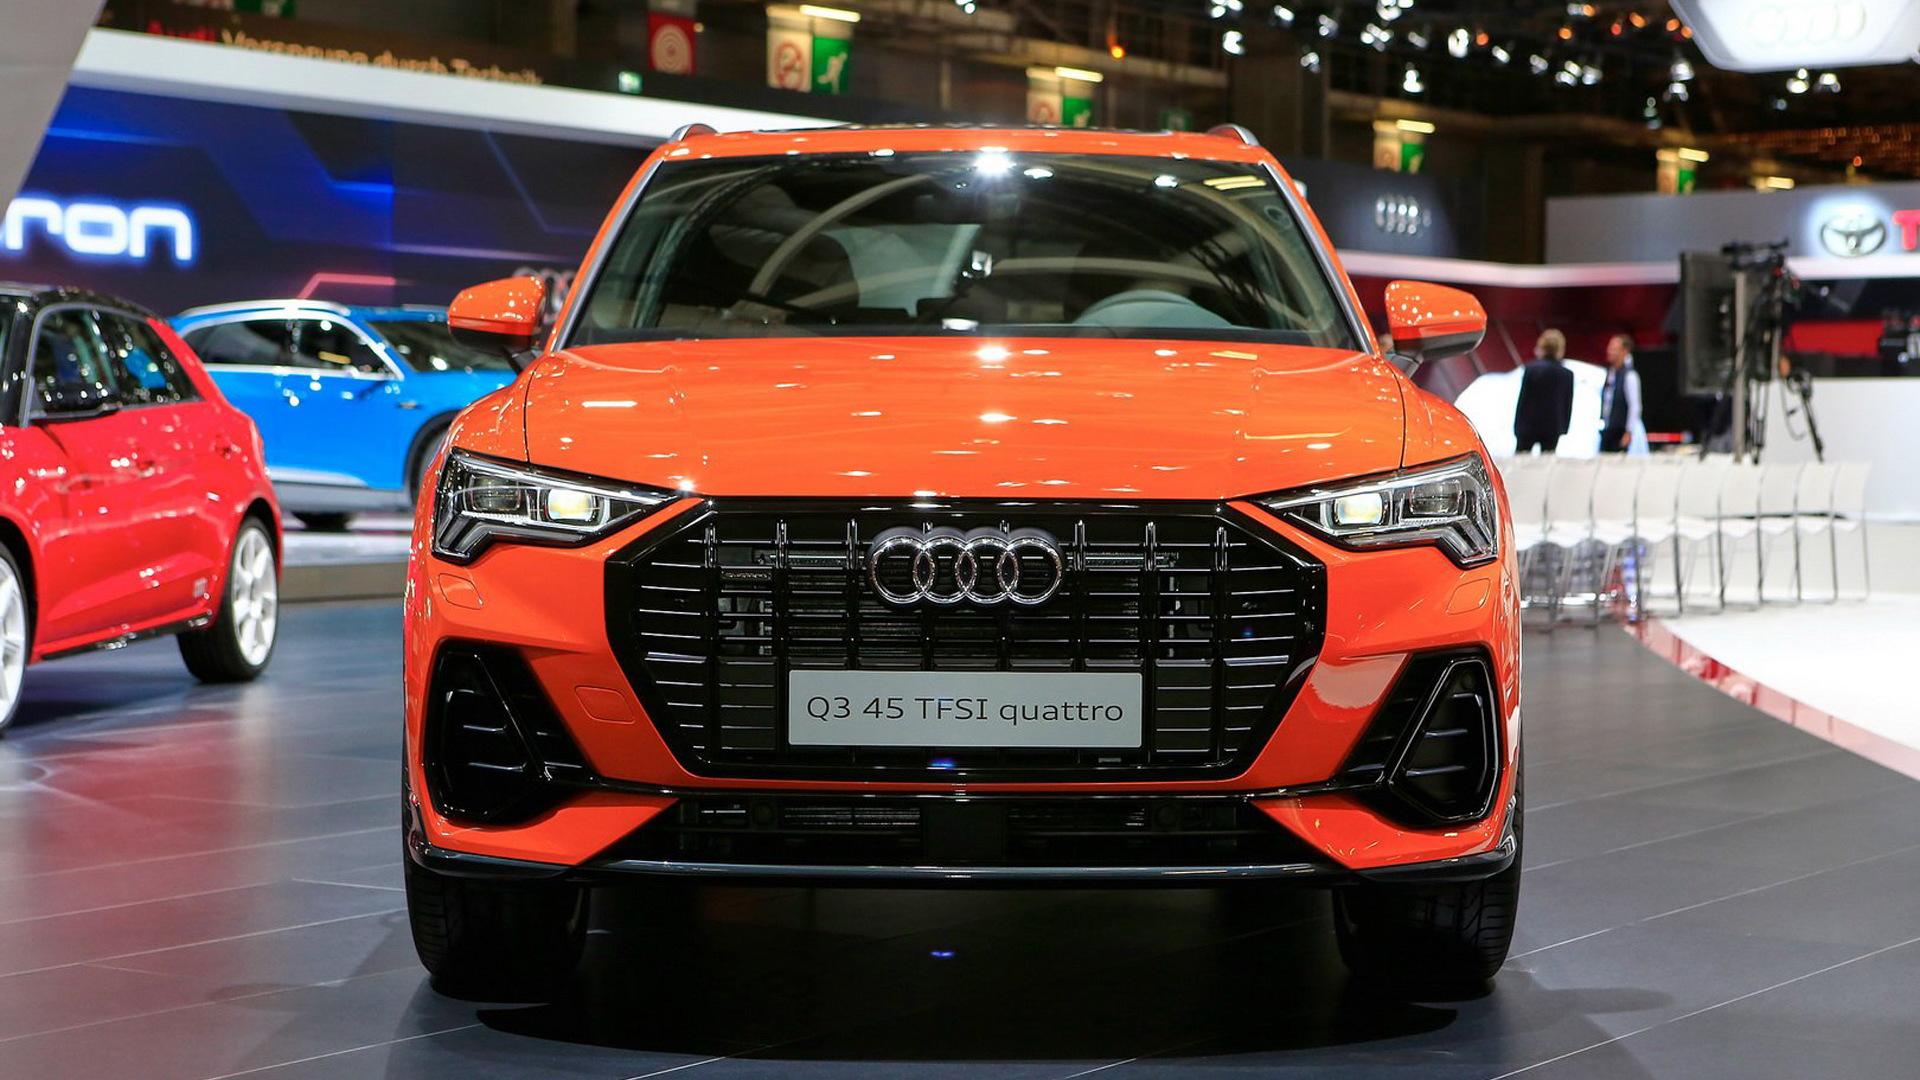 2019 Audi Q3, 2018 Paris auto show